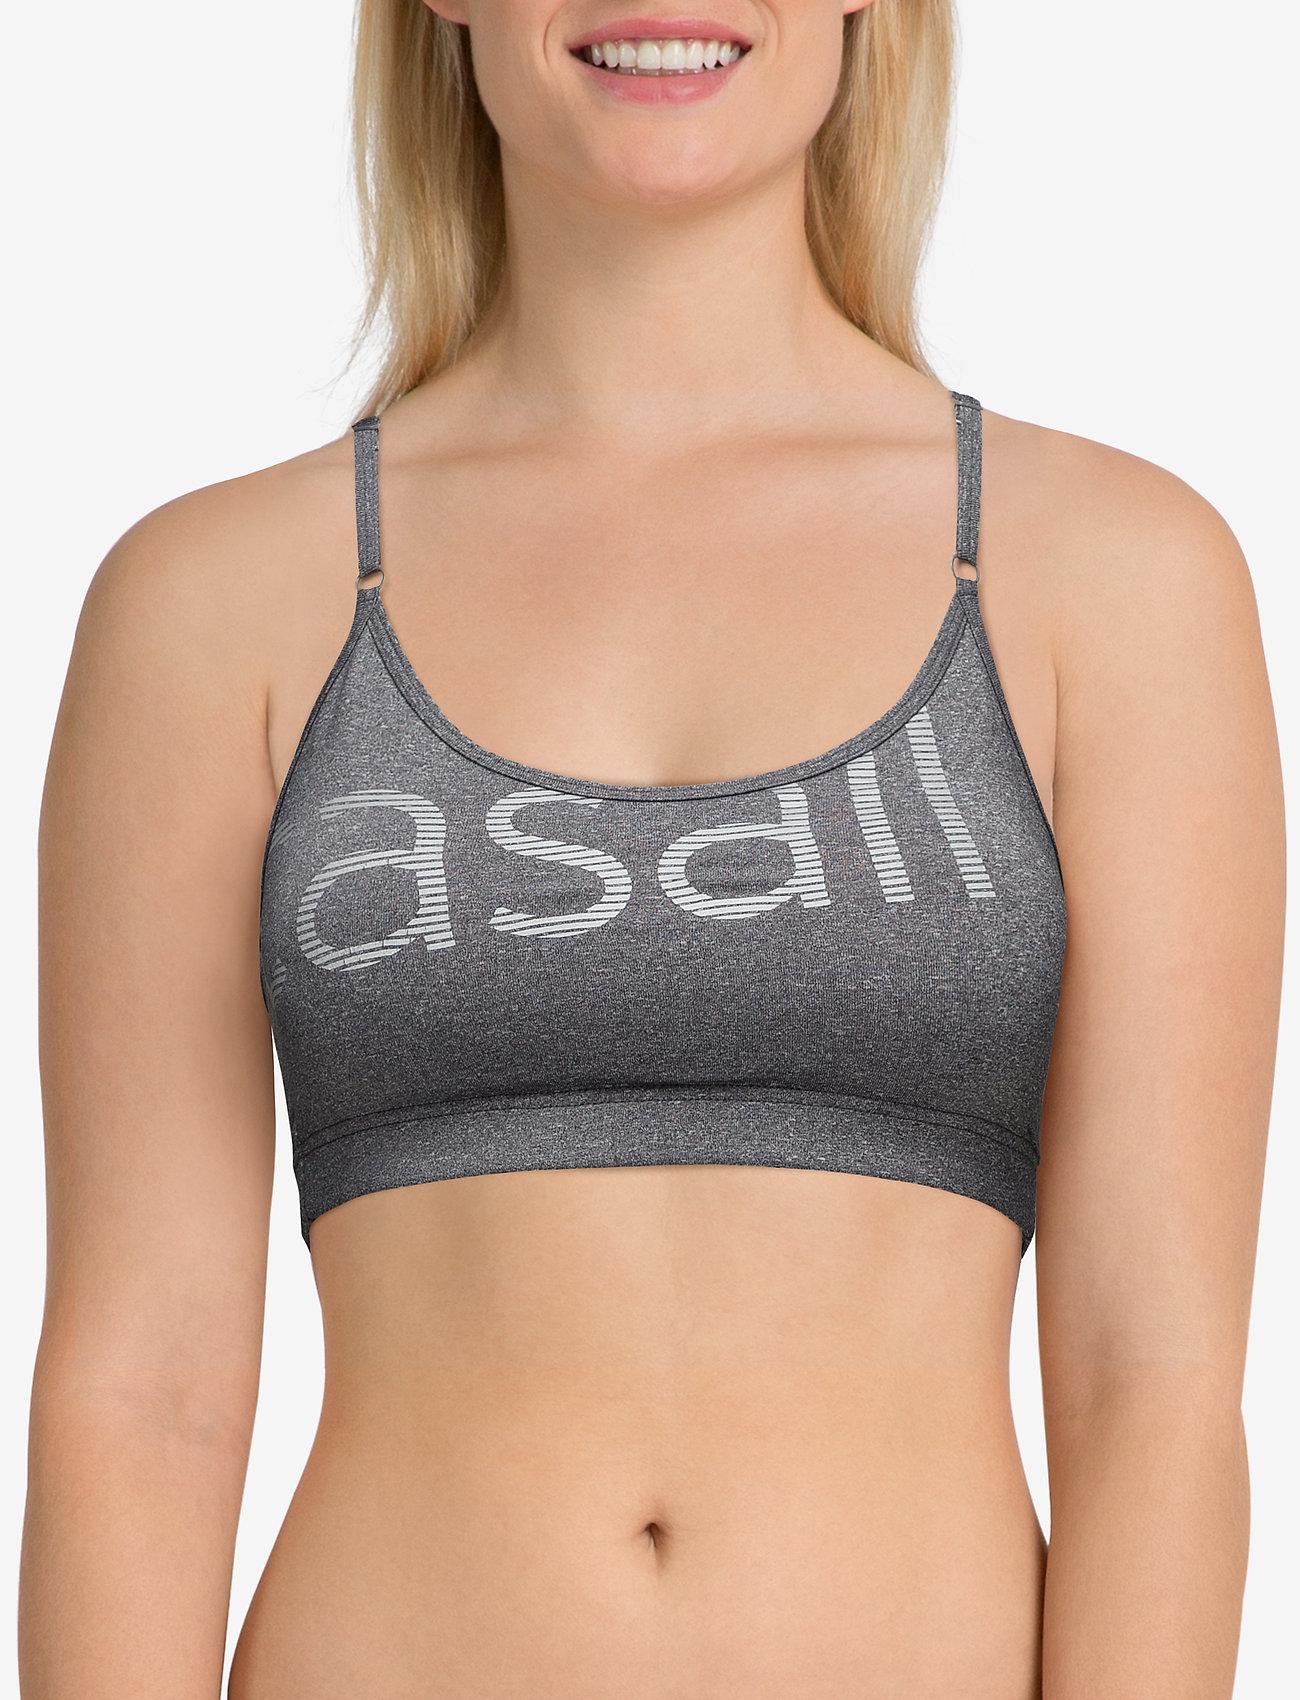 Casall Glorious sports bra - DK GREY MELANGE/SILVER